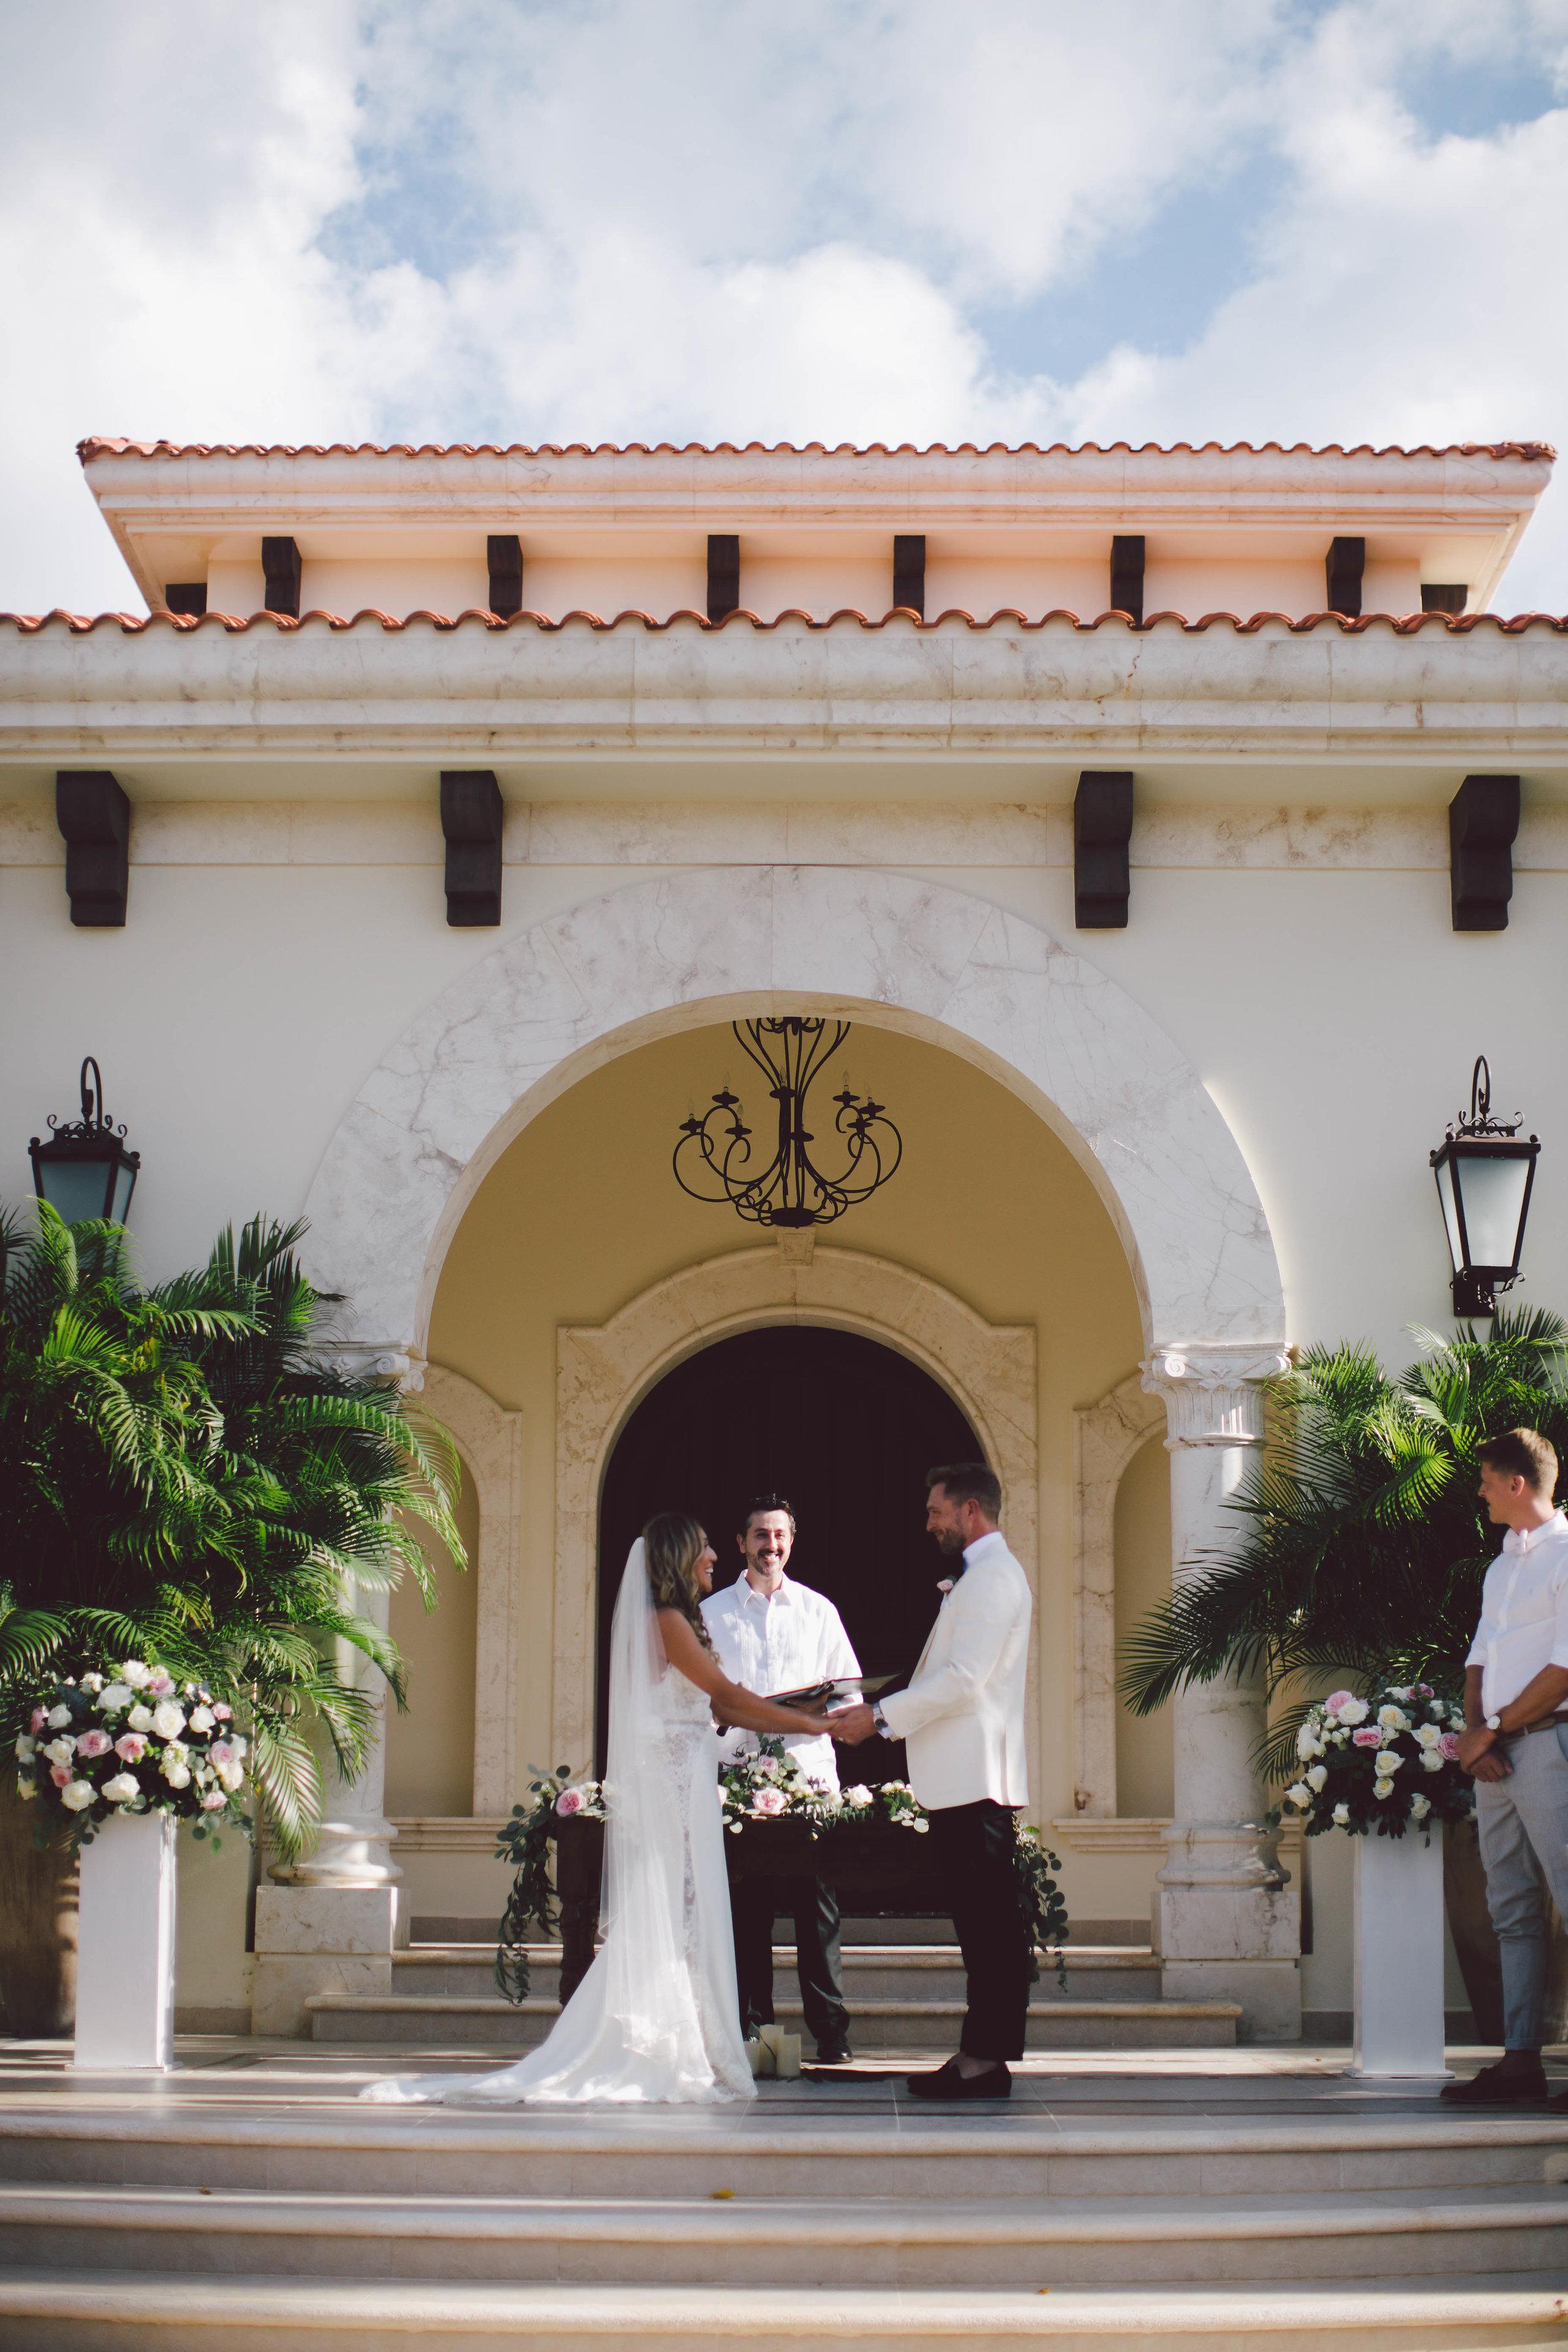 mexico_wedding_cancun_villa_la_joya_evangeline_lane_044.jpg